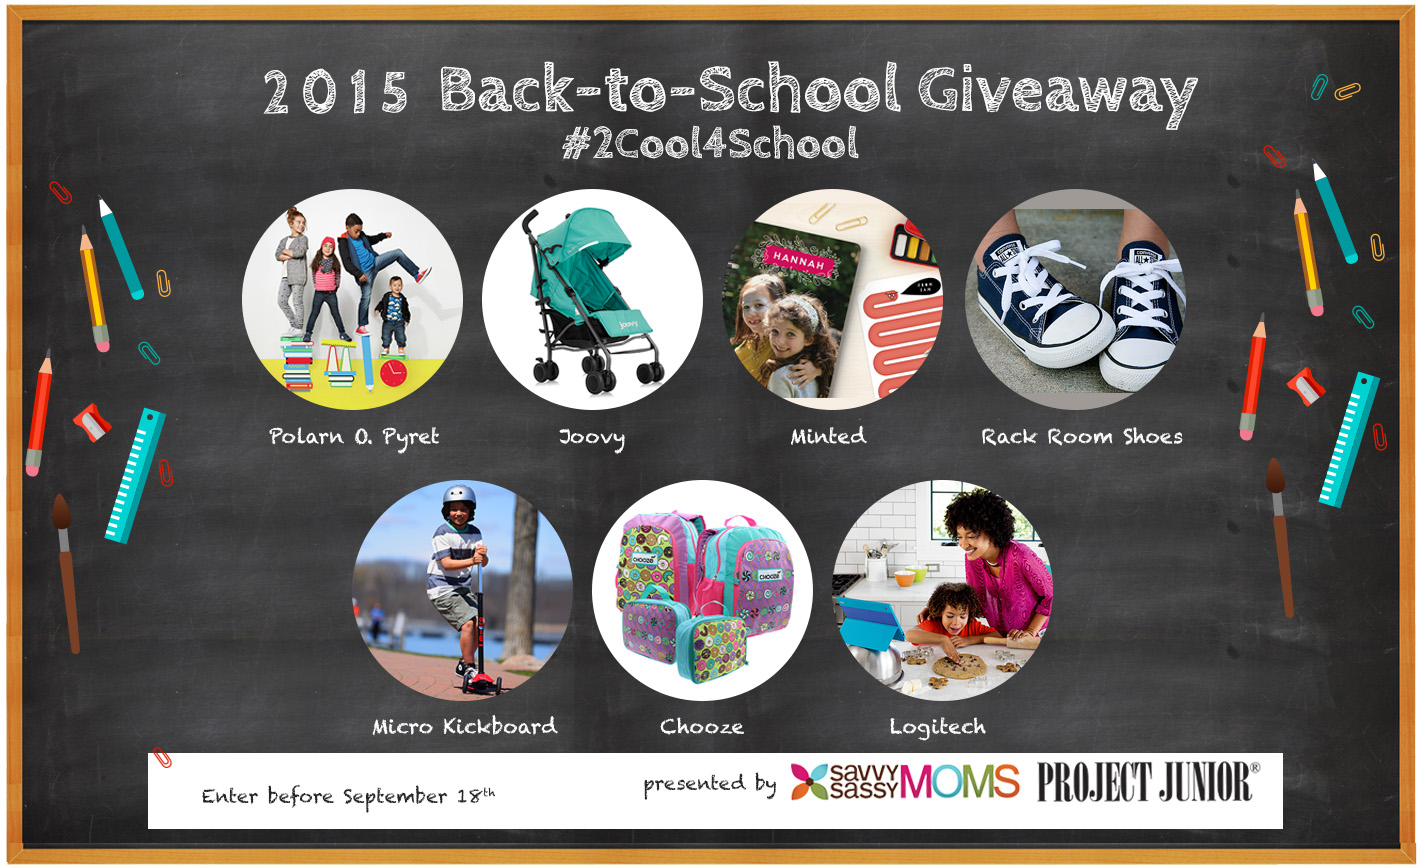 #2Cool4School Back-to-School Giveaway